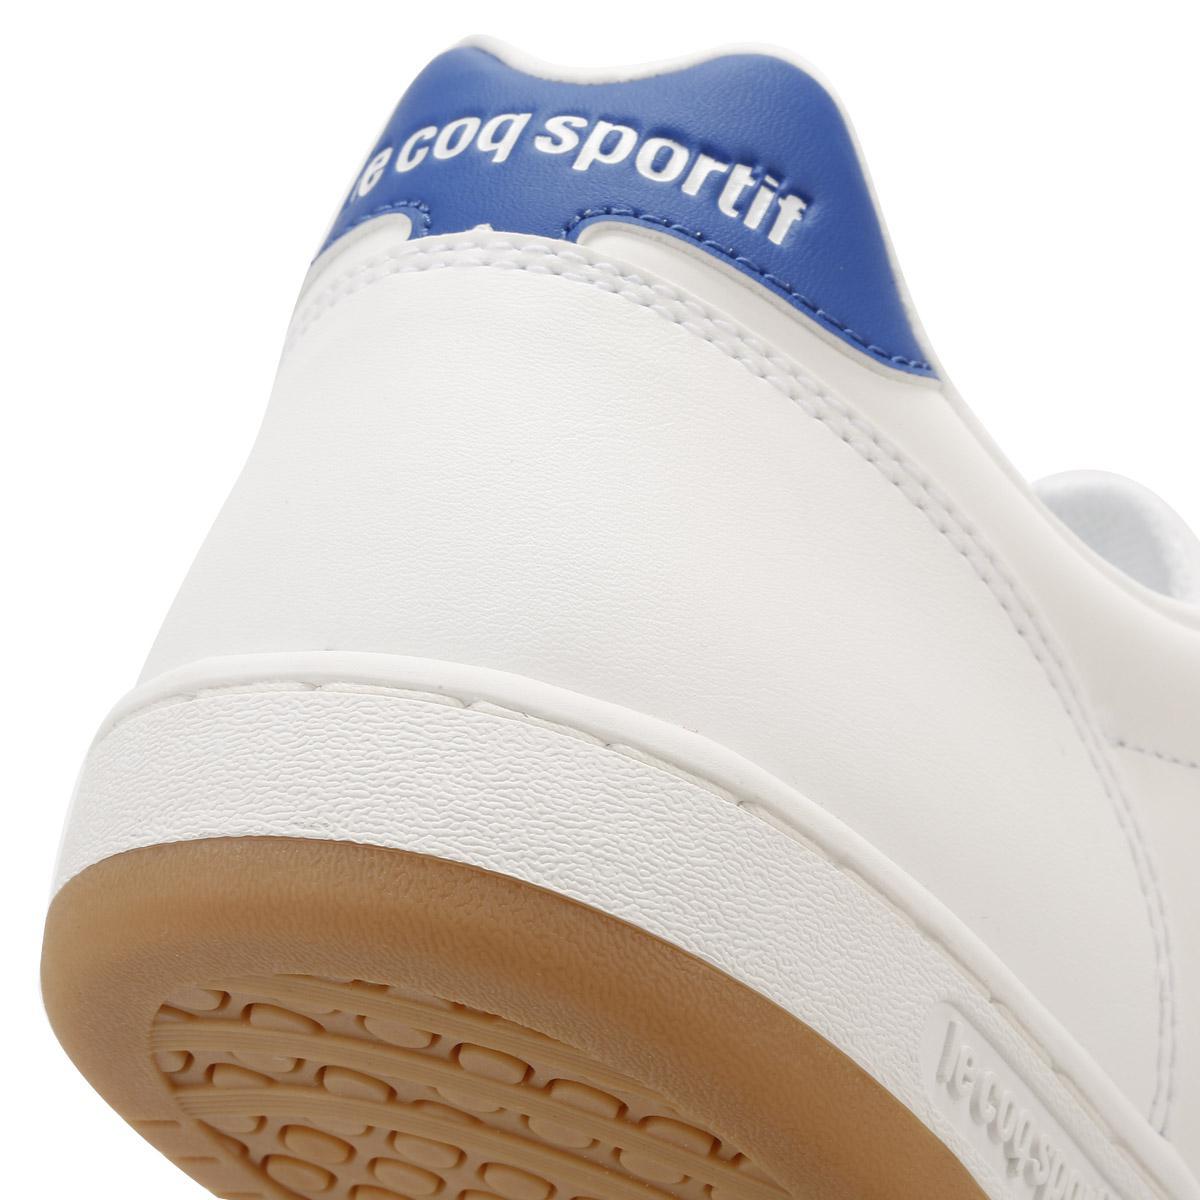 e8e80ce82603 Le Coq Sportif Mens Optical White   Classic Blue Icons Trainers in ...